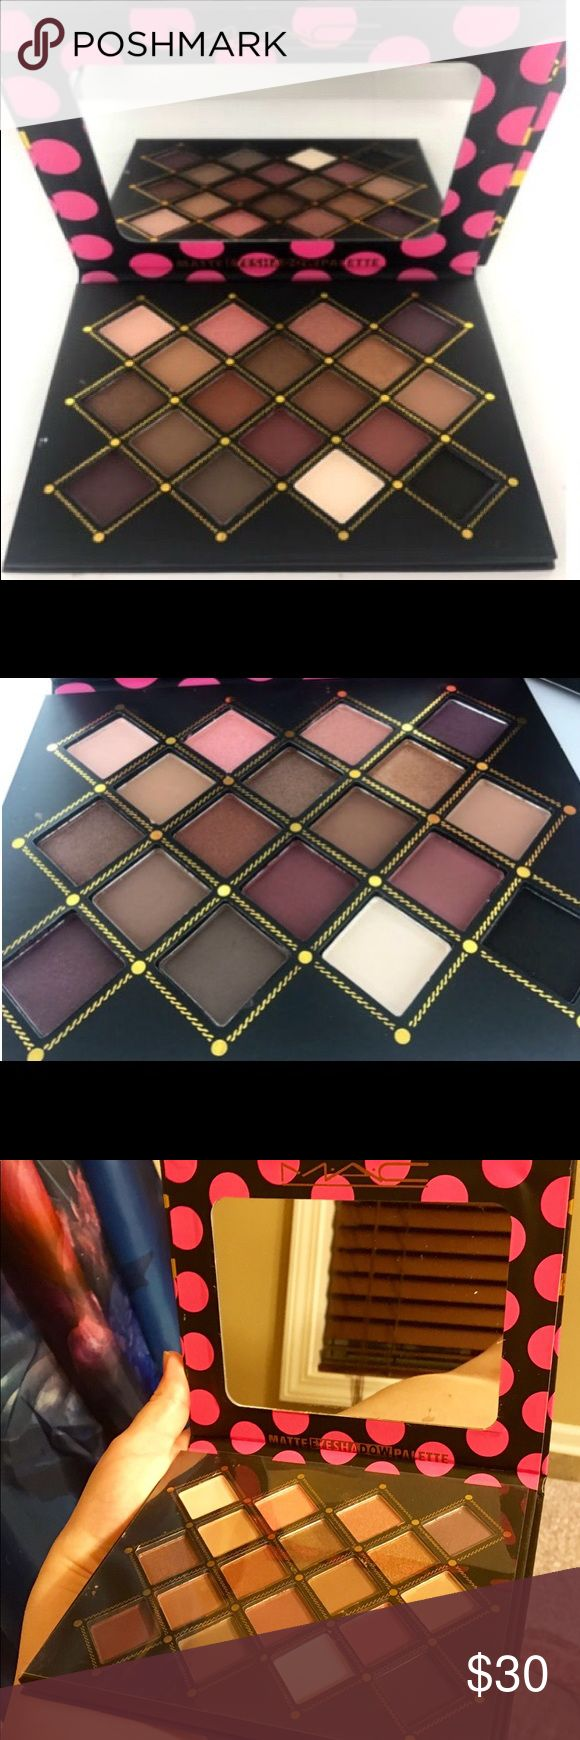 Brand new 18 color MAC matte eyeshadow palette. MAC matte eyeshadow.  New and in box. MAC Makeup Eyeshadow #colorfuleyeshadows